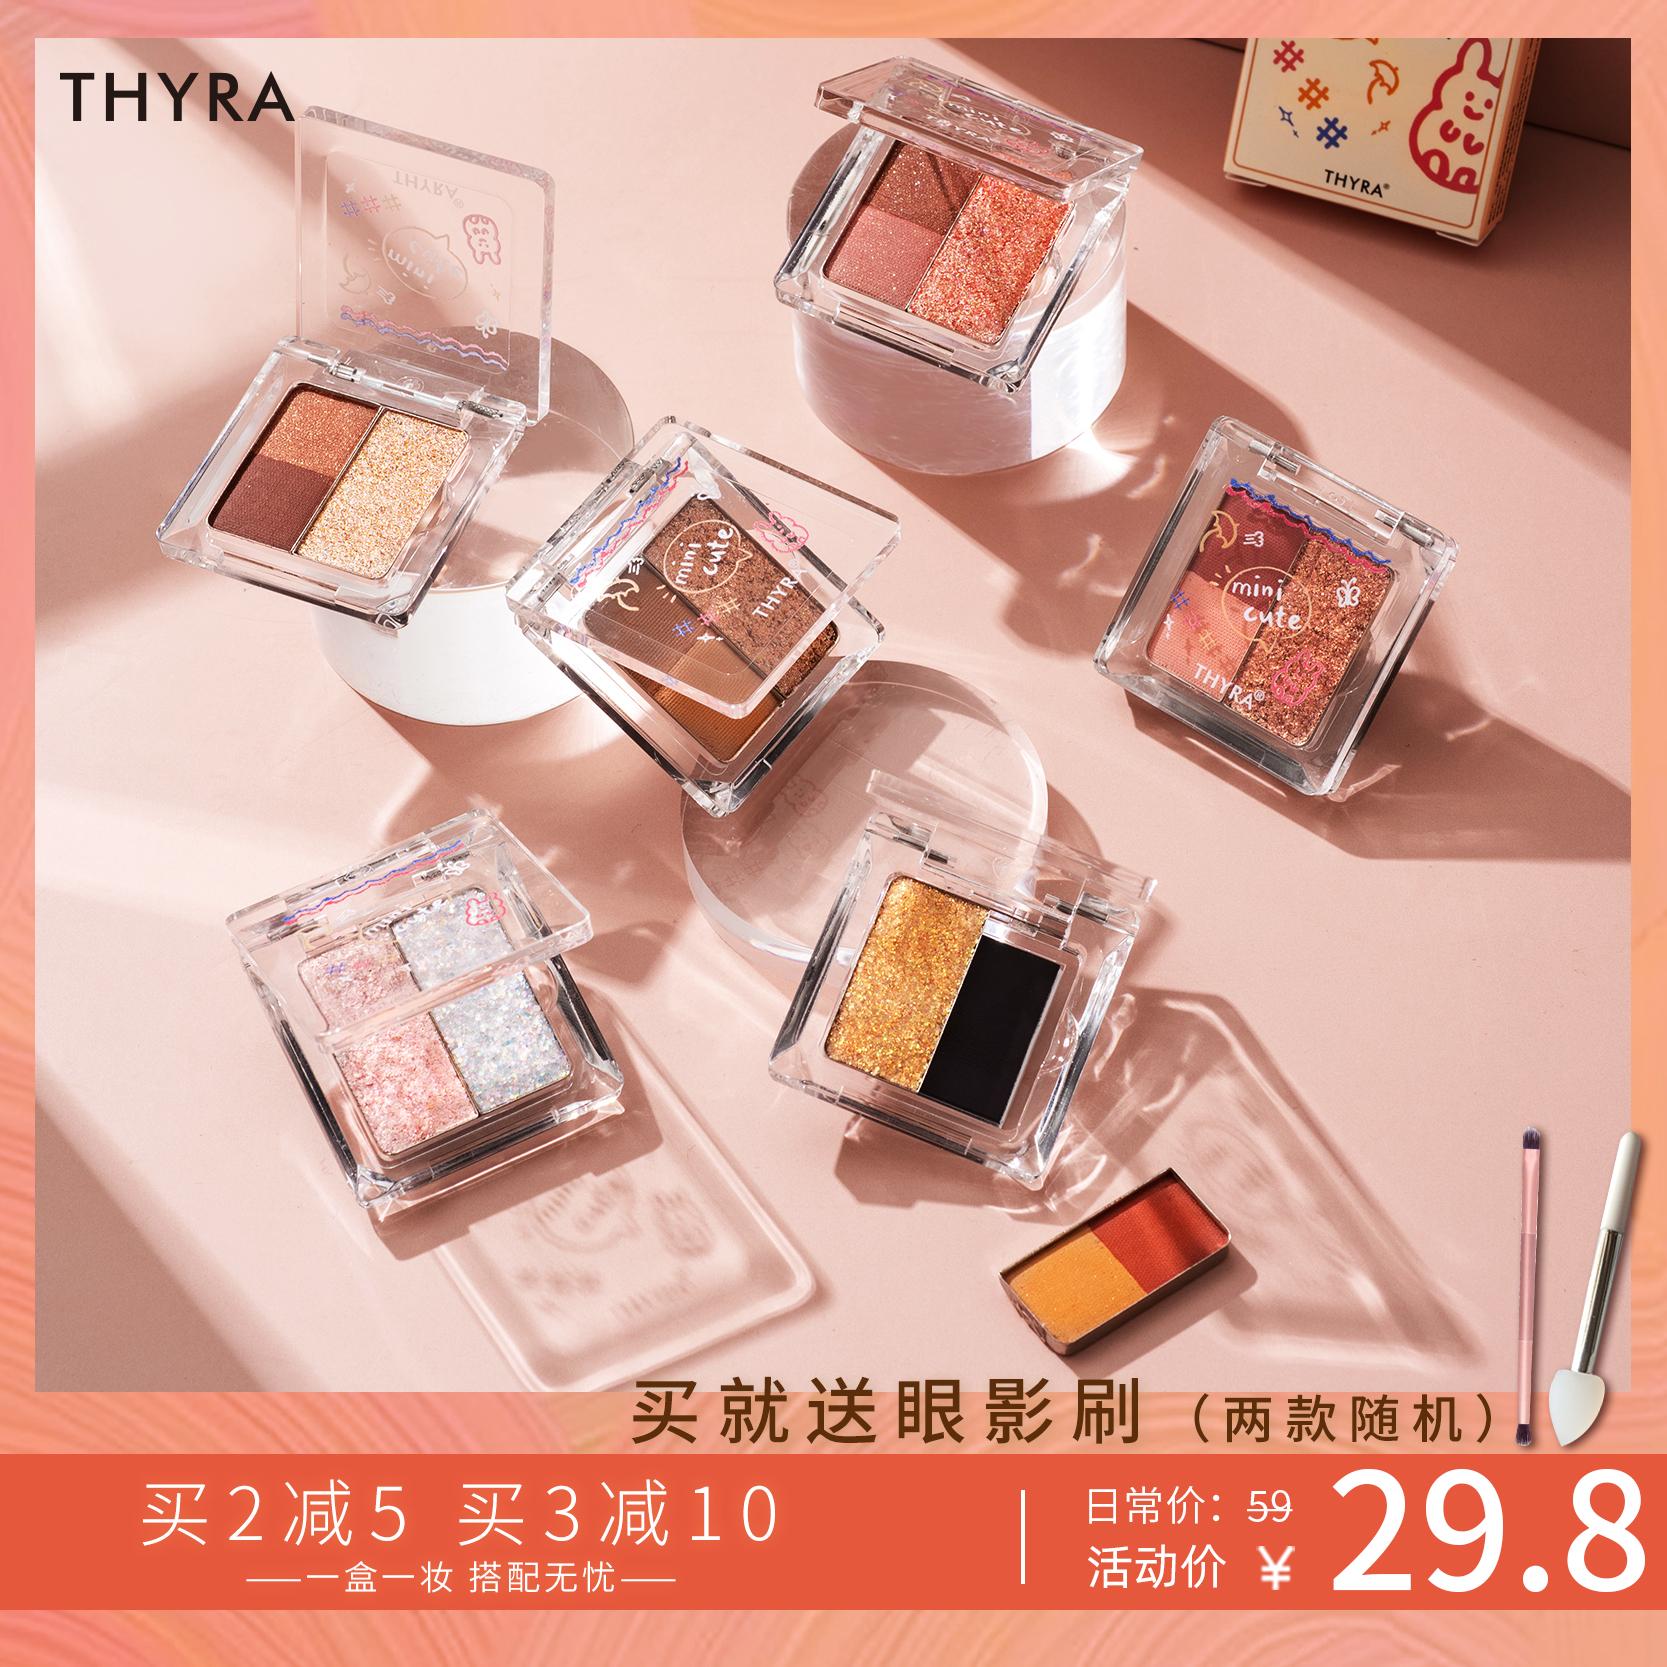 Thyra/昙雅小萌新系列三色眼影大地色拼色亮片珠光闪粉学生平价